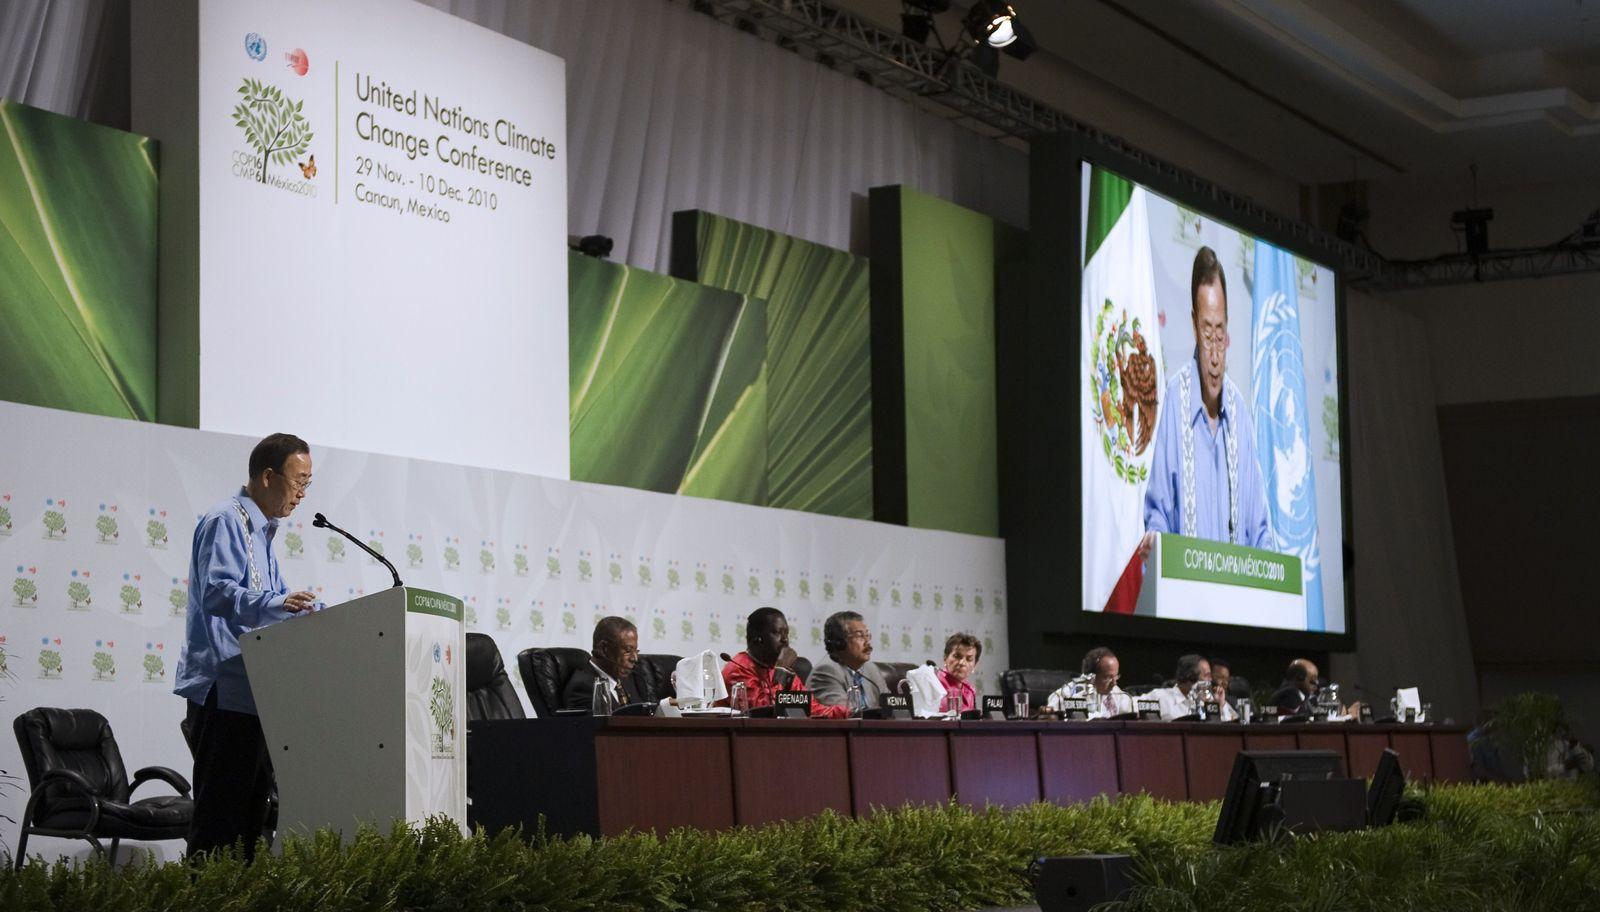 Klimagipfel / Cancun / COP 16